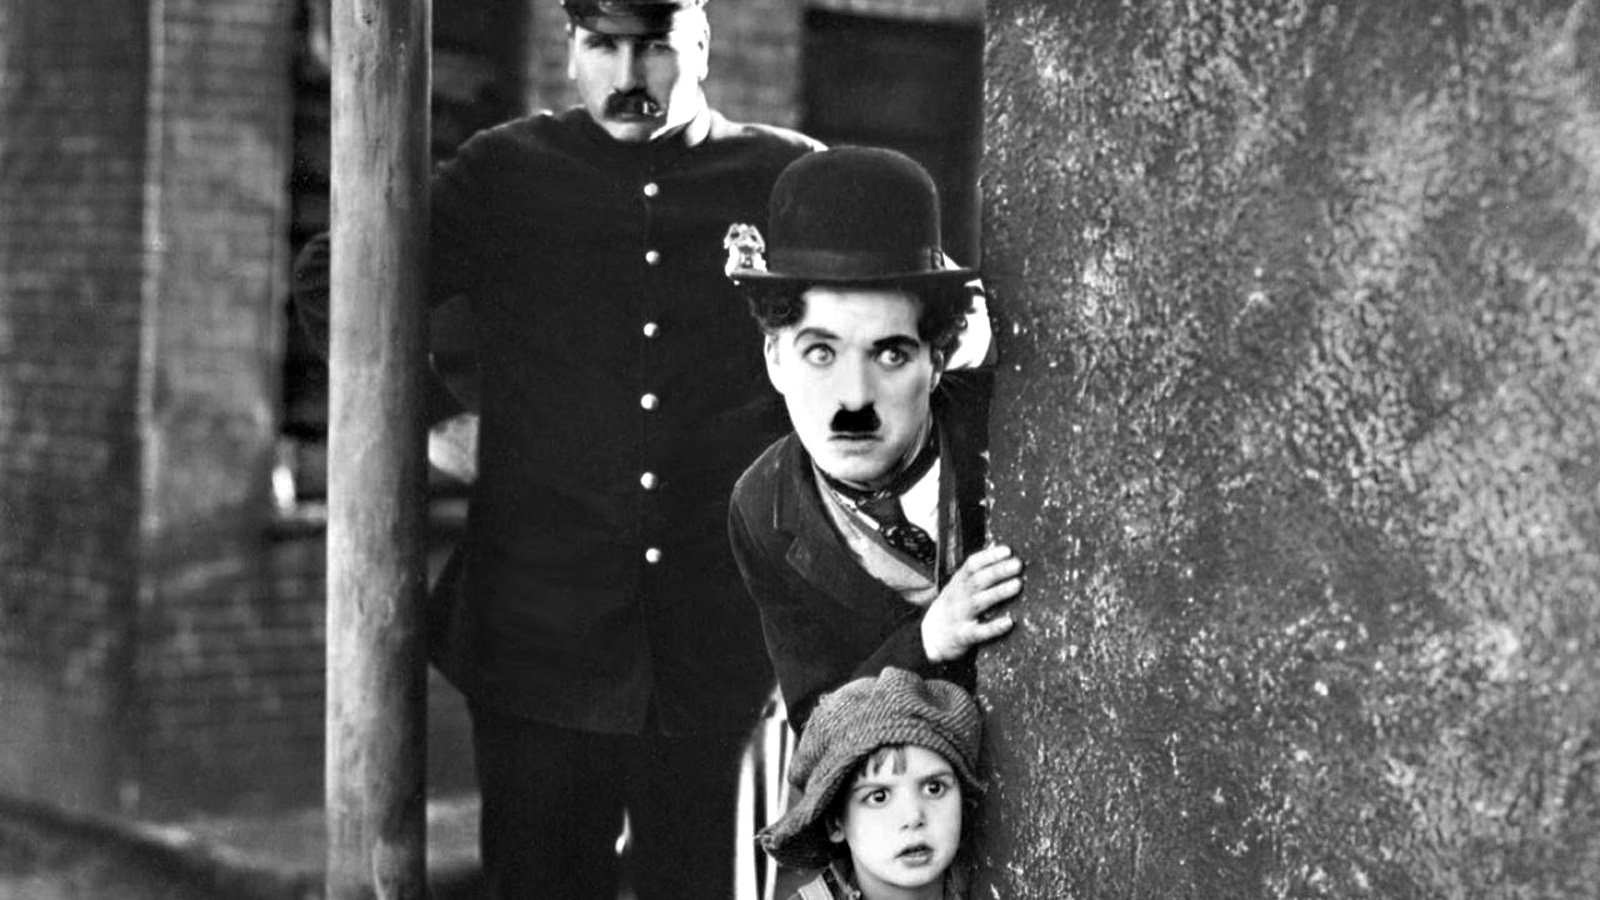 Chaplins pojke (1921)